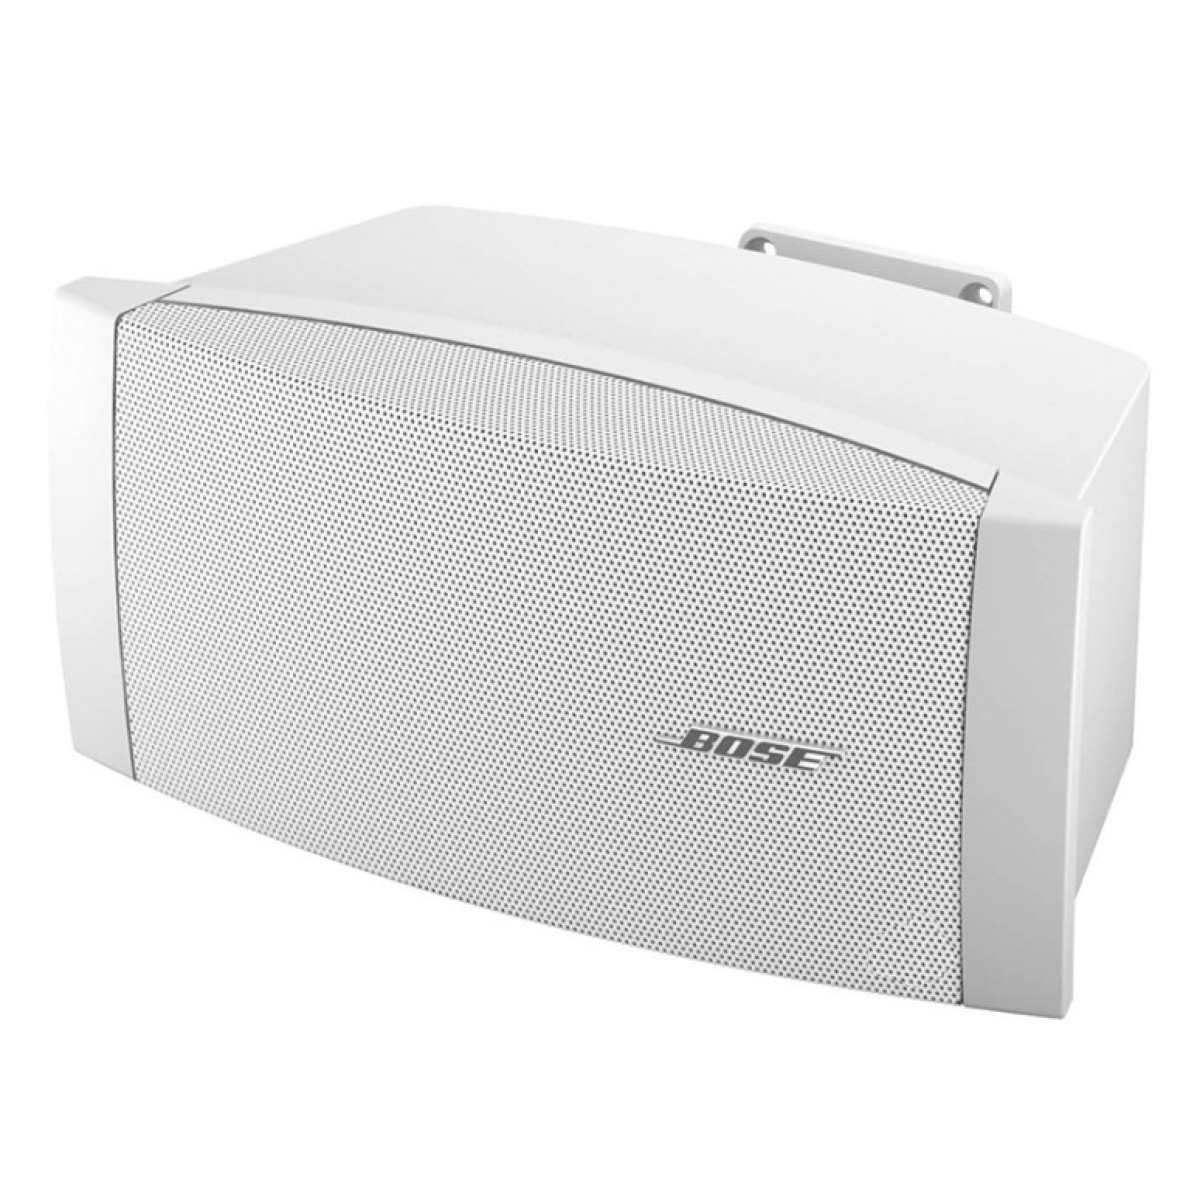 Bose Freespace DS 40se Caixa Acustica Externa Outdoor  - Audio Video & cia